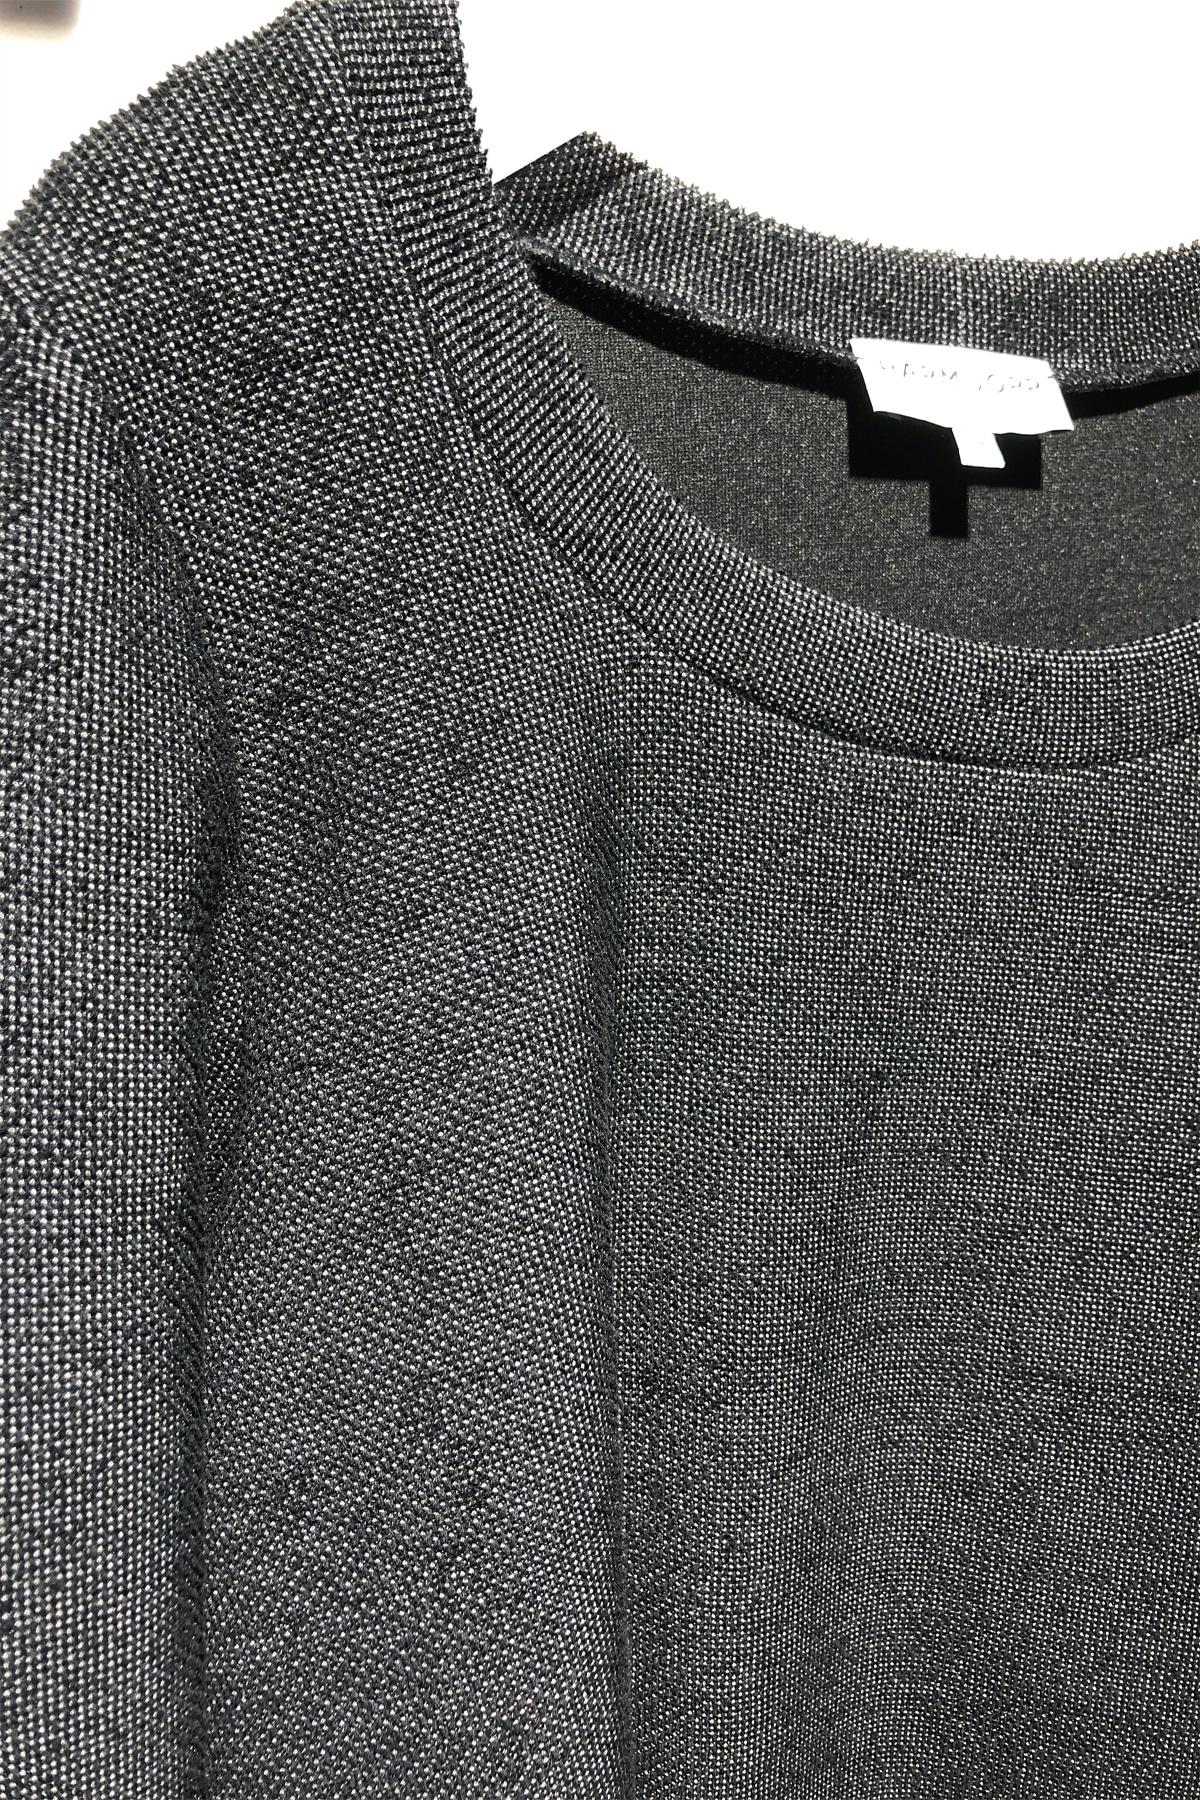 pulli wool 1